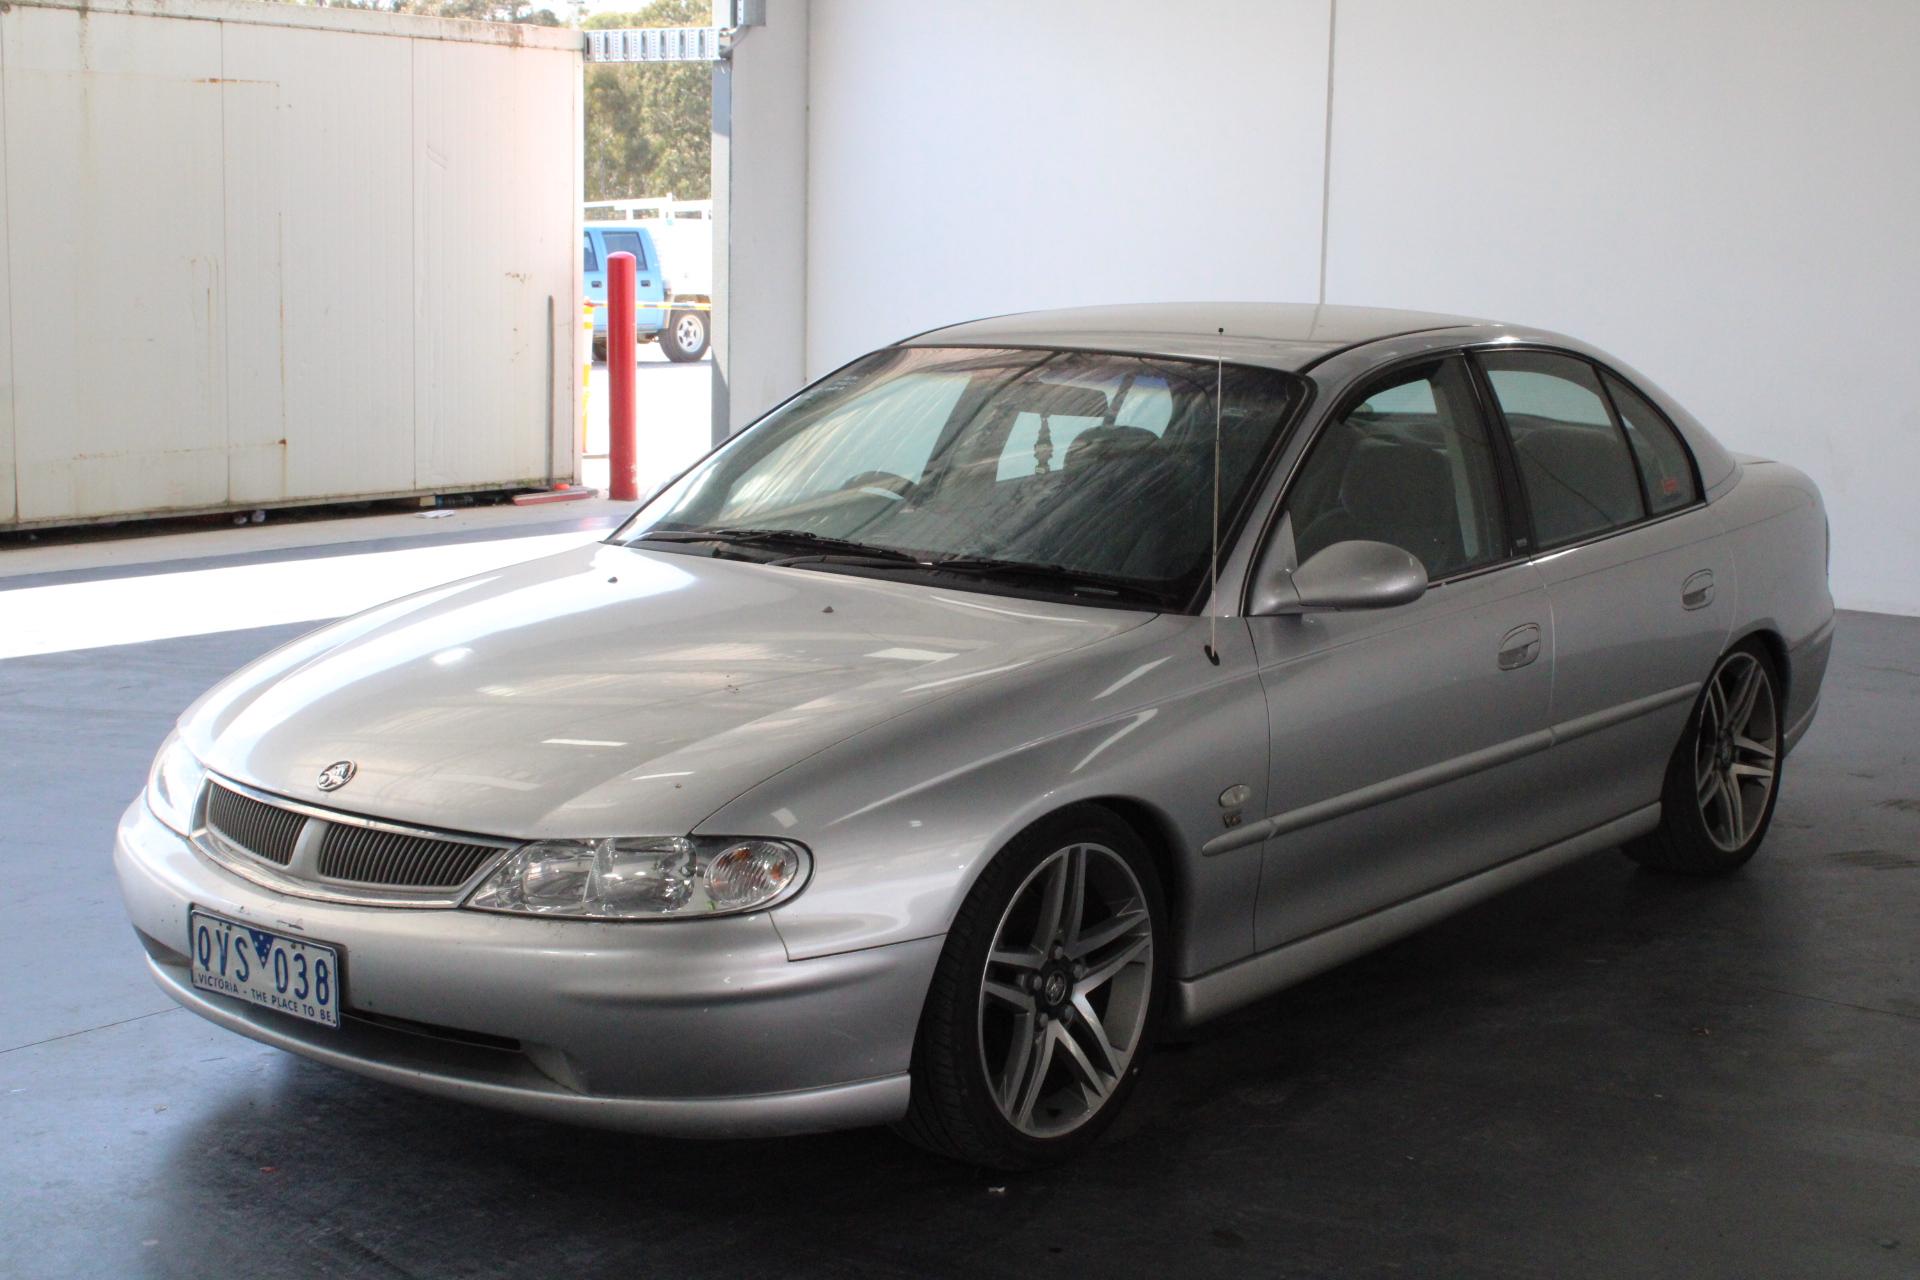 2001 Holden Berlina VX Automatic Sedan